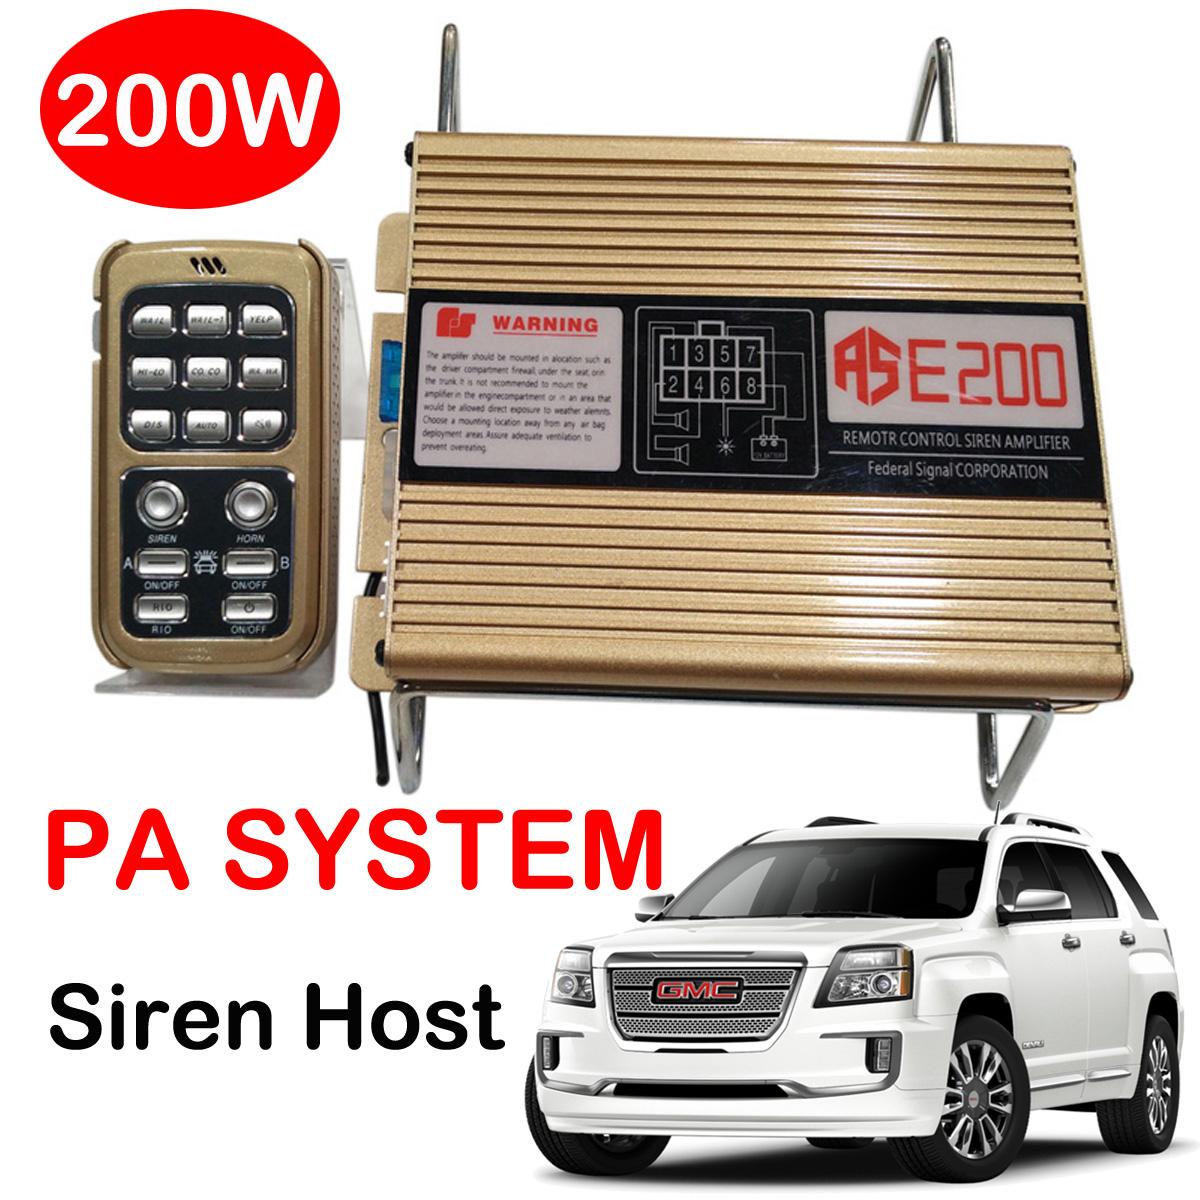 200w Police Fire Siren Horn Speaker Pa System Kit Car Warning Alarm Tone Circuit Control Host